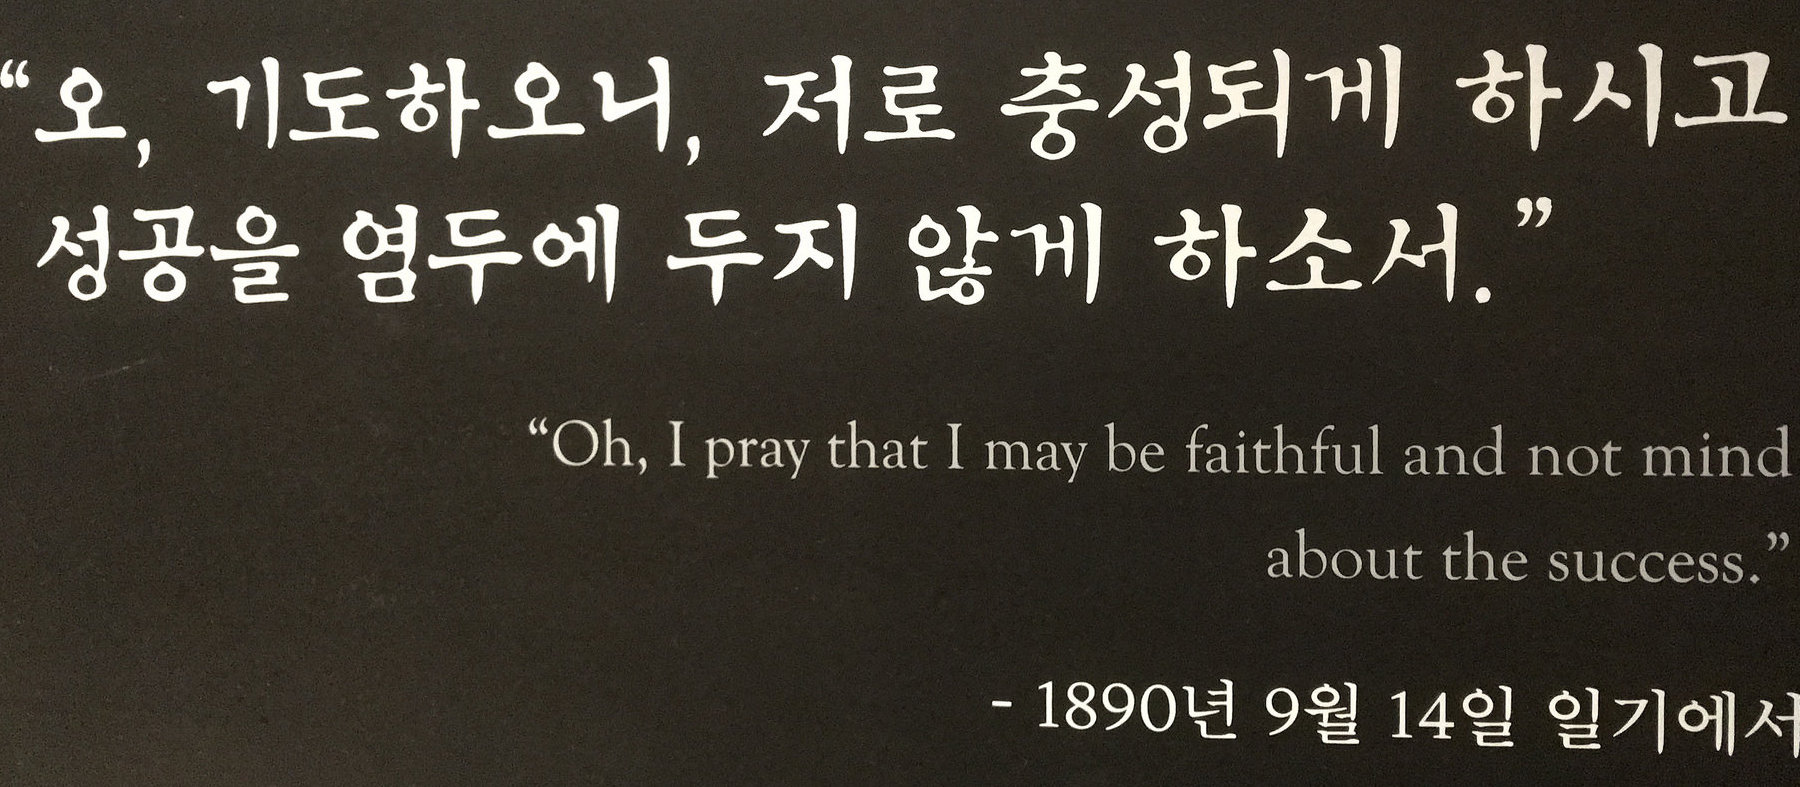 Unbroken Prayer 2